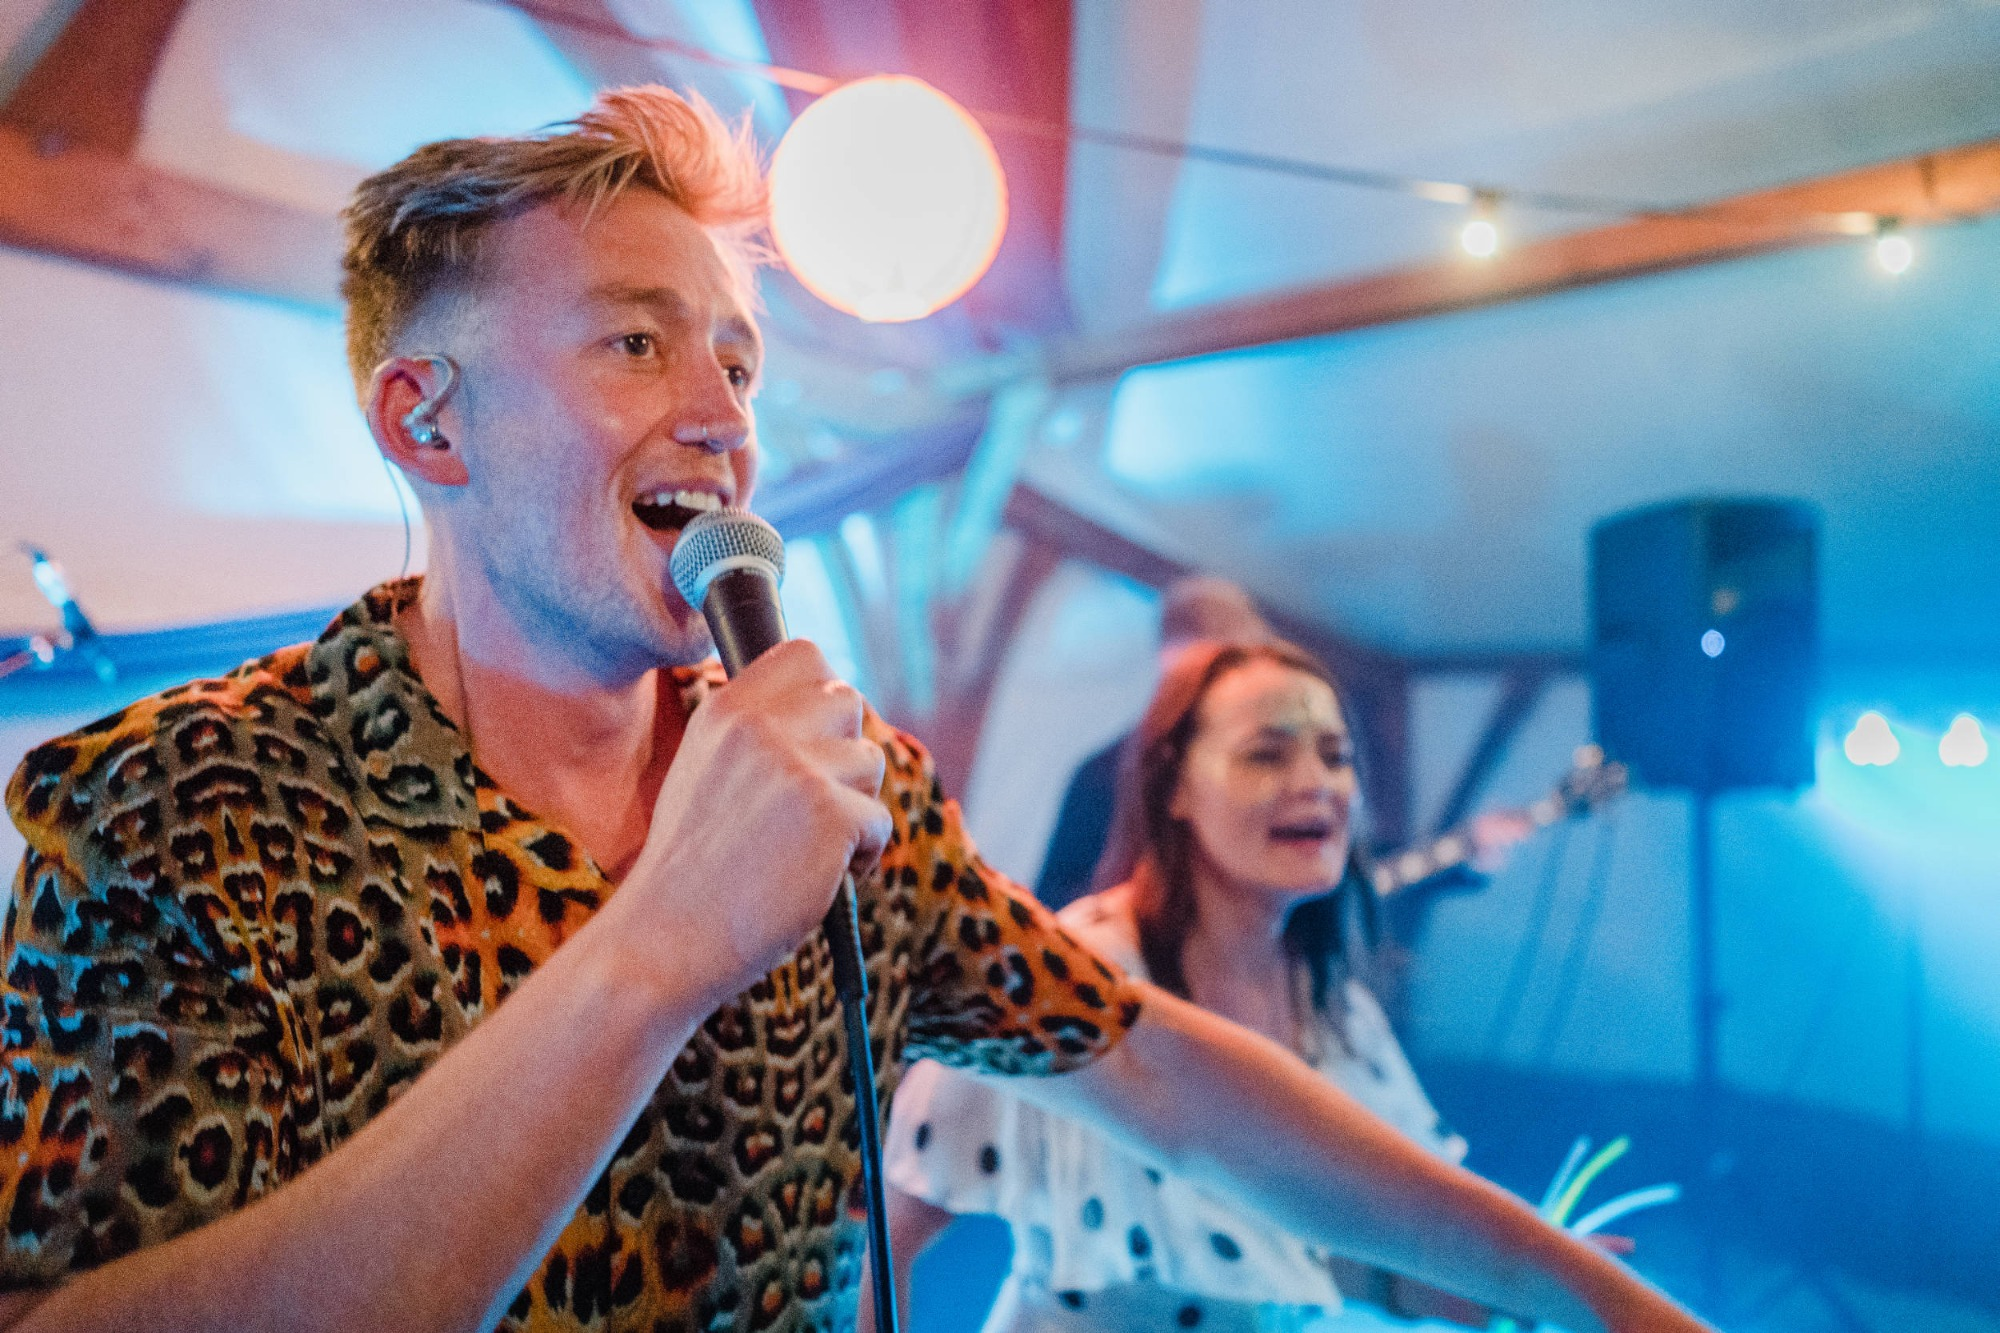 Promo Melody Makers Function Band Bristol